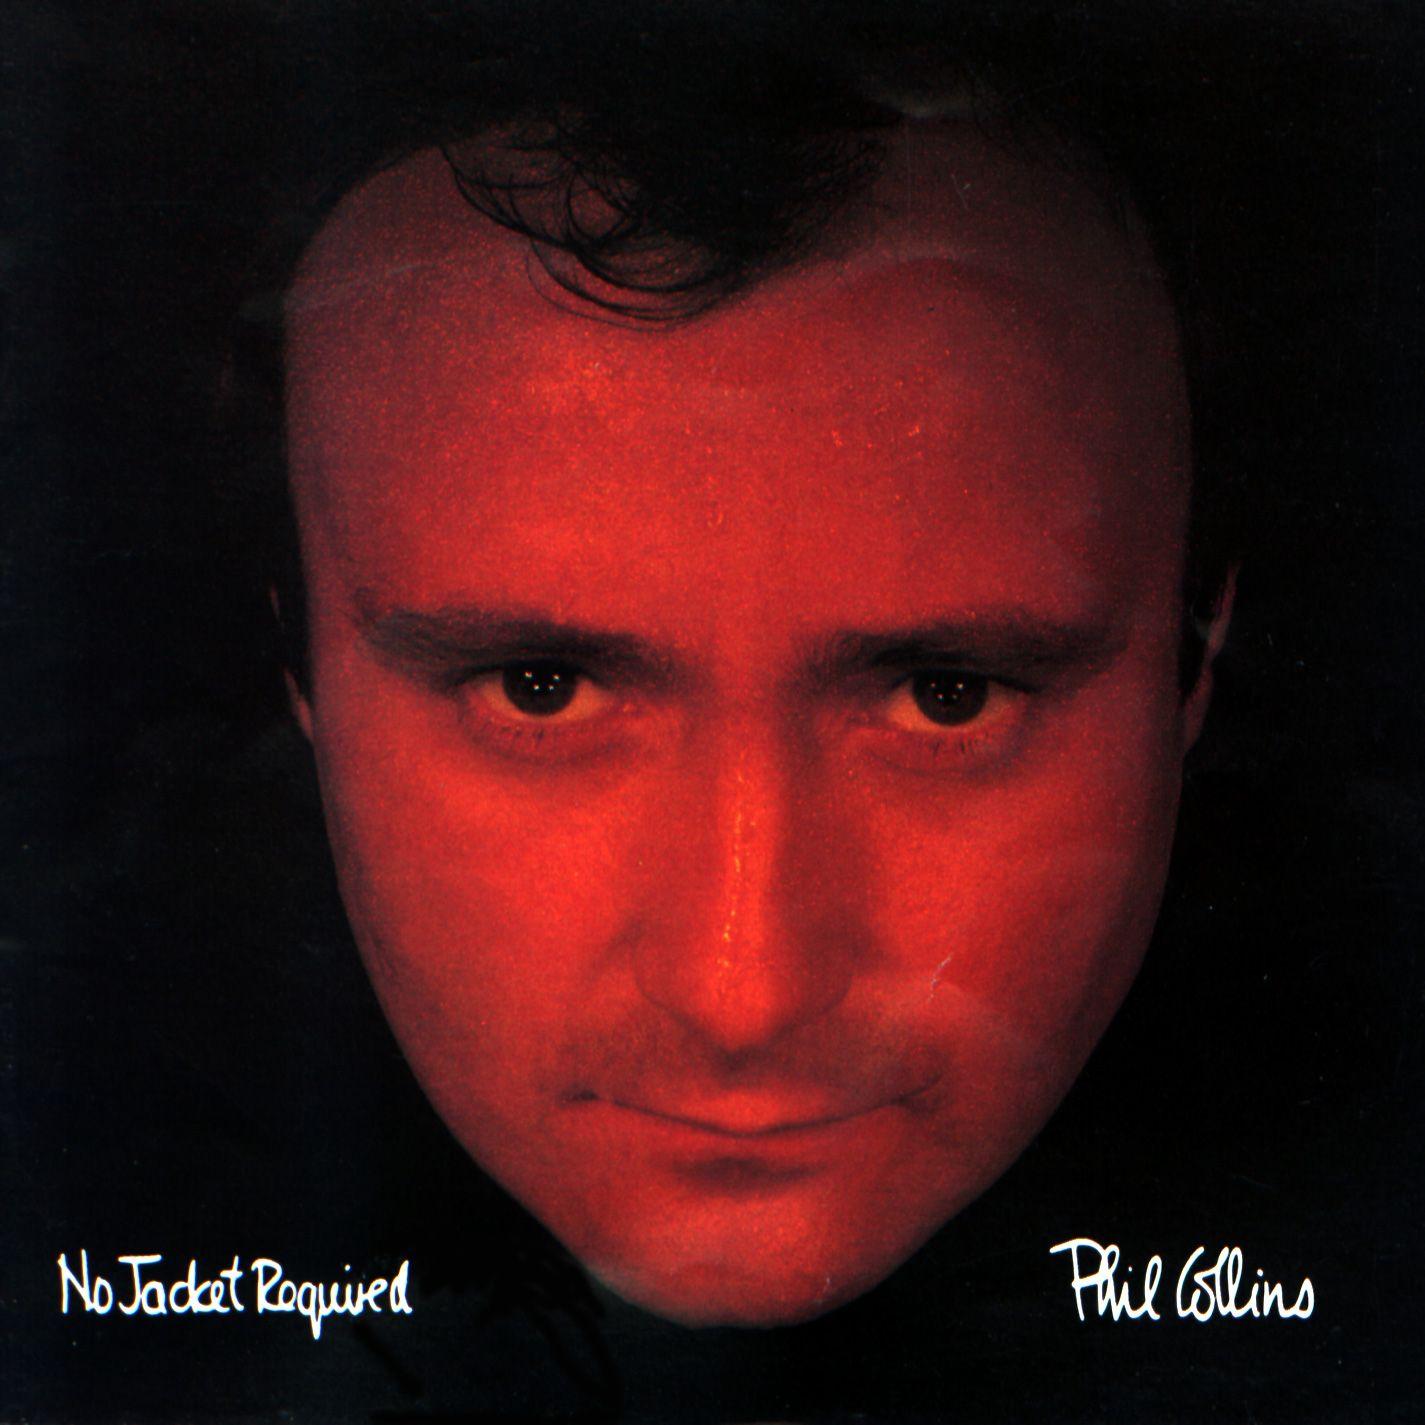 http://3.bp.blogspot.com/-V49hy7BG-2A/UDkCRV_PE3I/AAAAAAAAEhA/lR9ViVQ0sd8/s1600/Phil+Collins+-+No+Jacket+Required+(1985).jpg